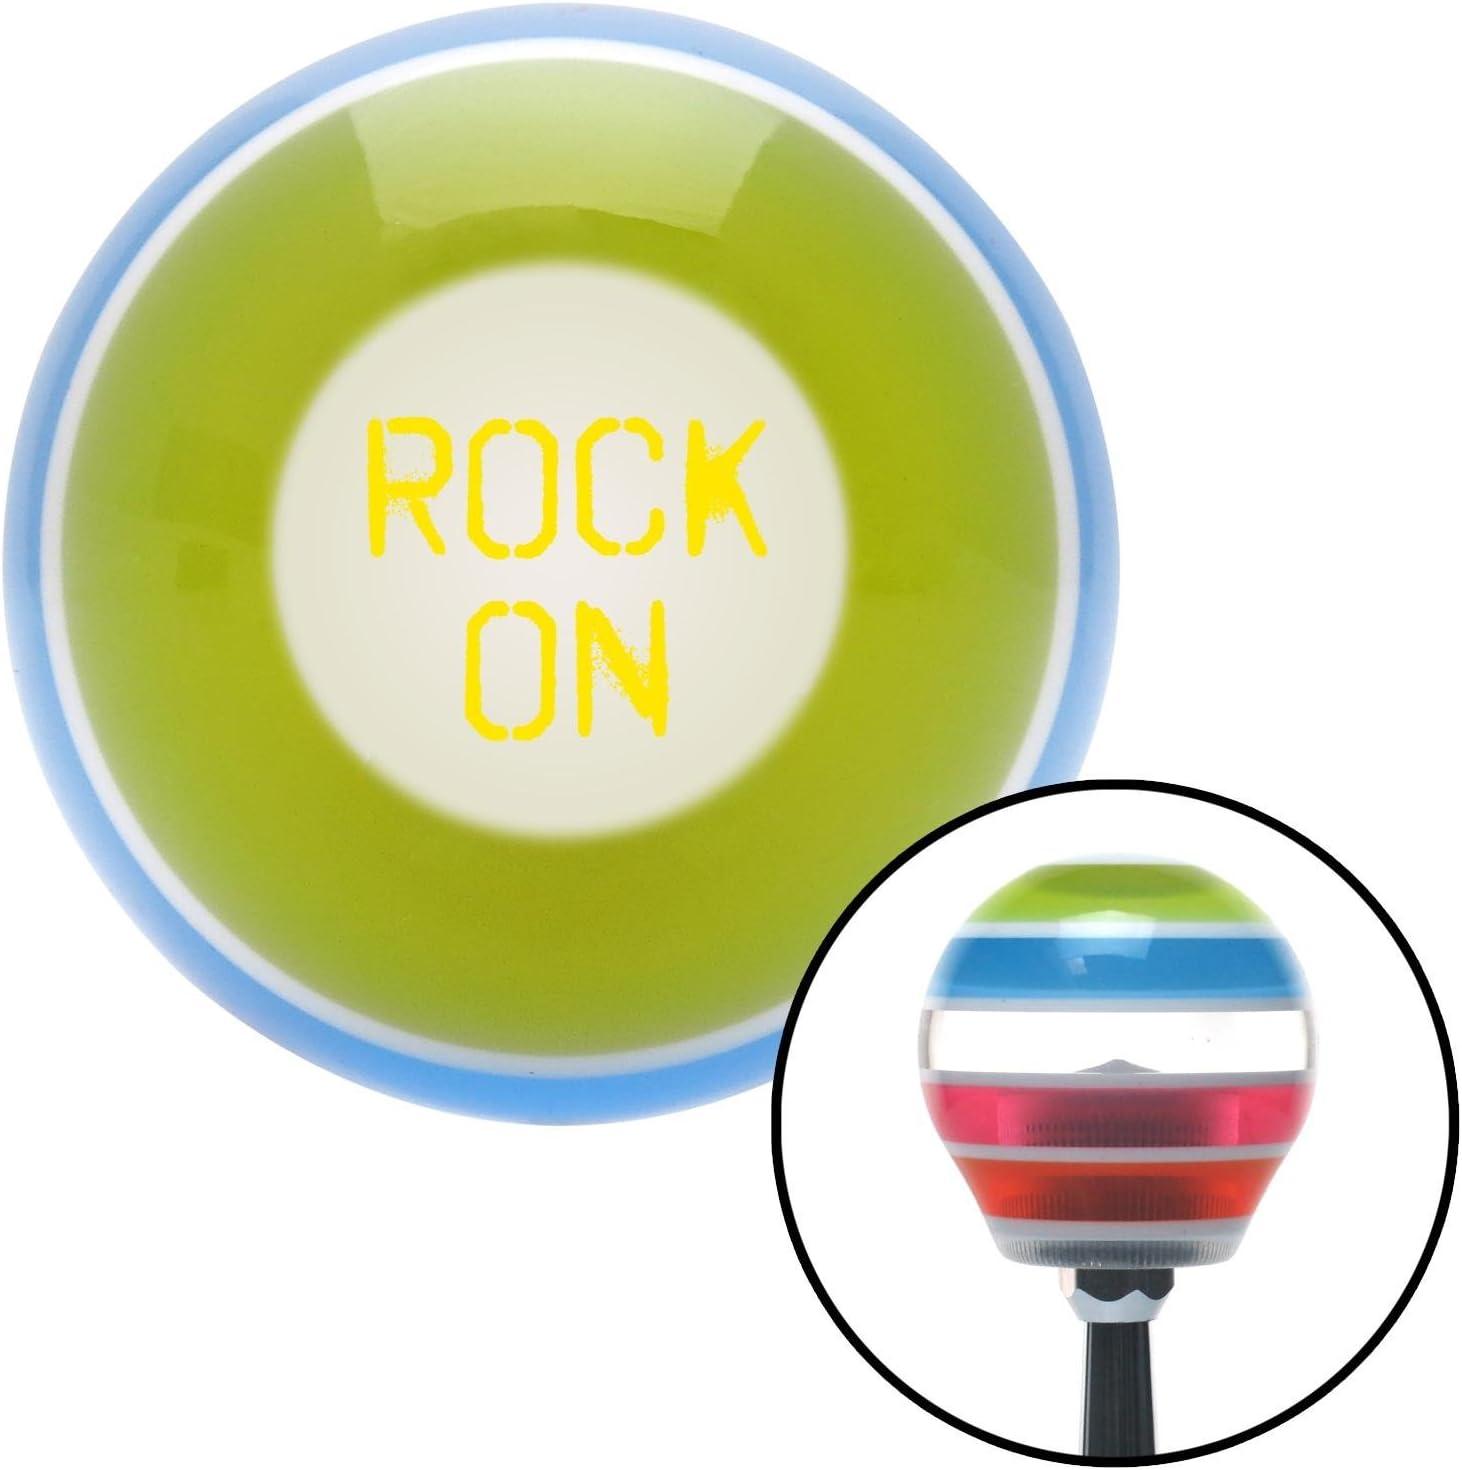 American Shifter 273479 Yellow Rock On Stripe Shift Knob with M16 x 1.5 Insert